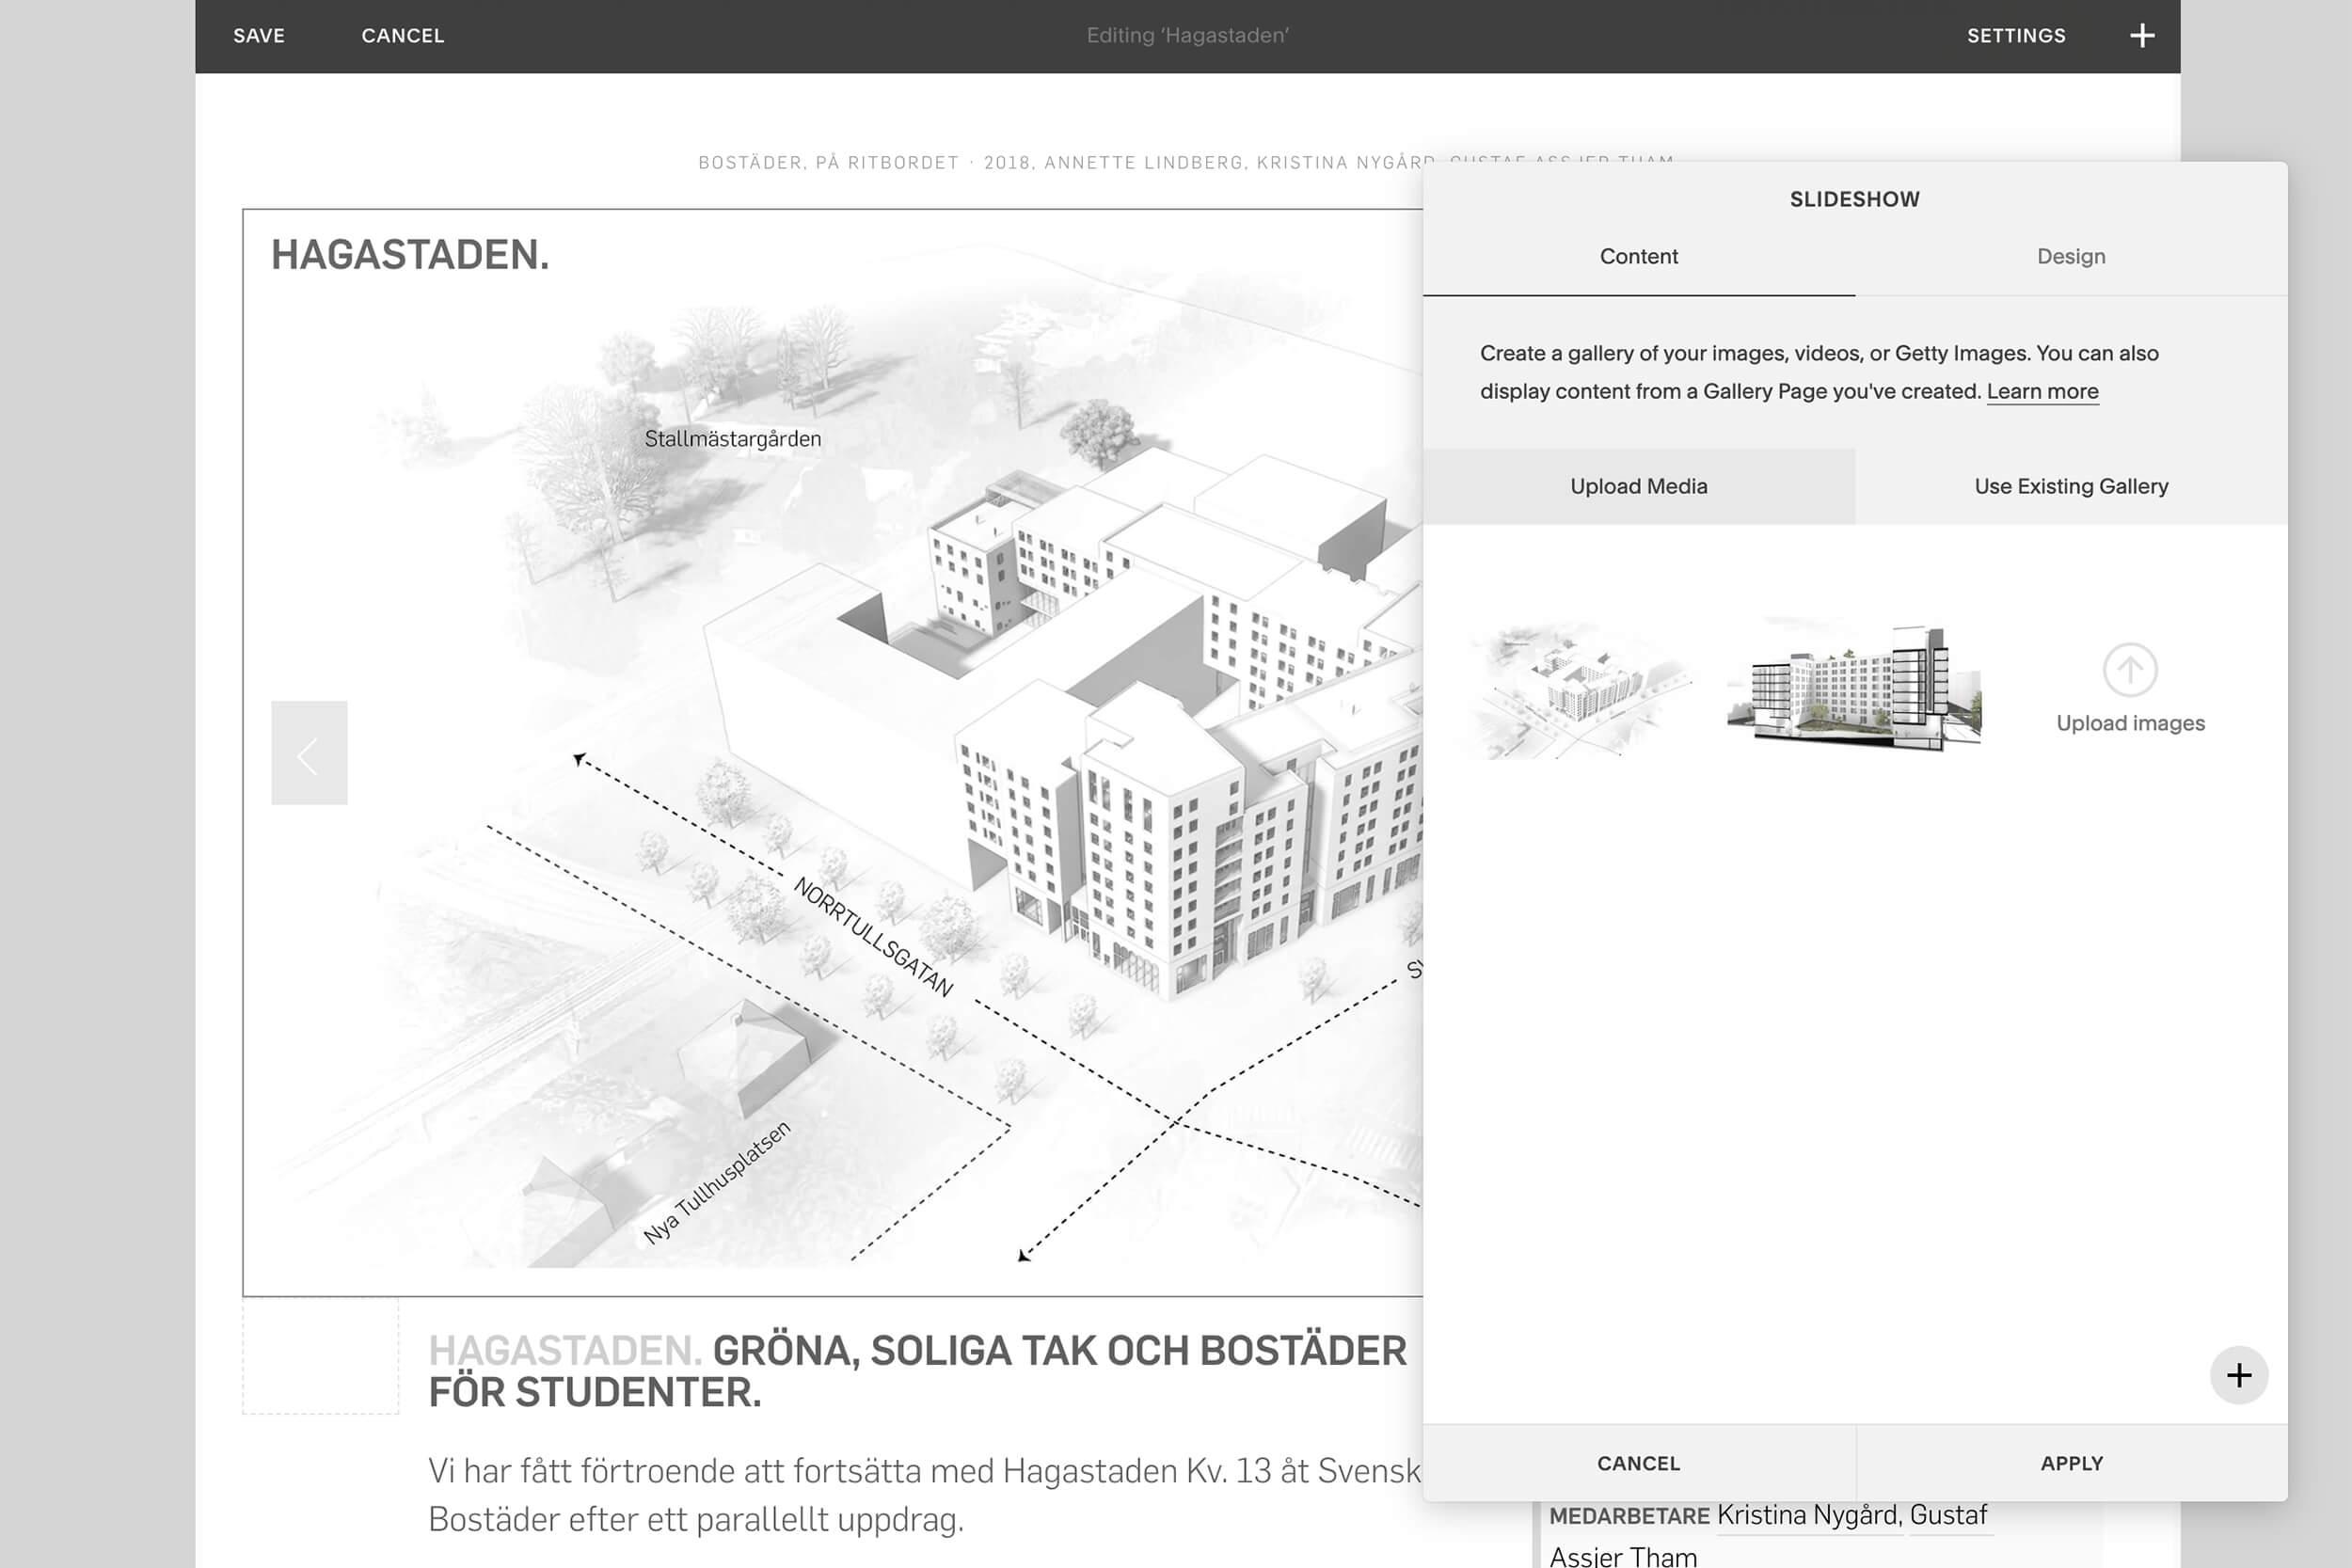 squarespace-ui_1_2500.jpg